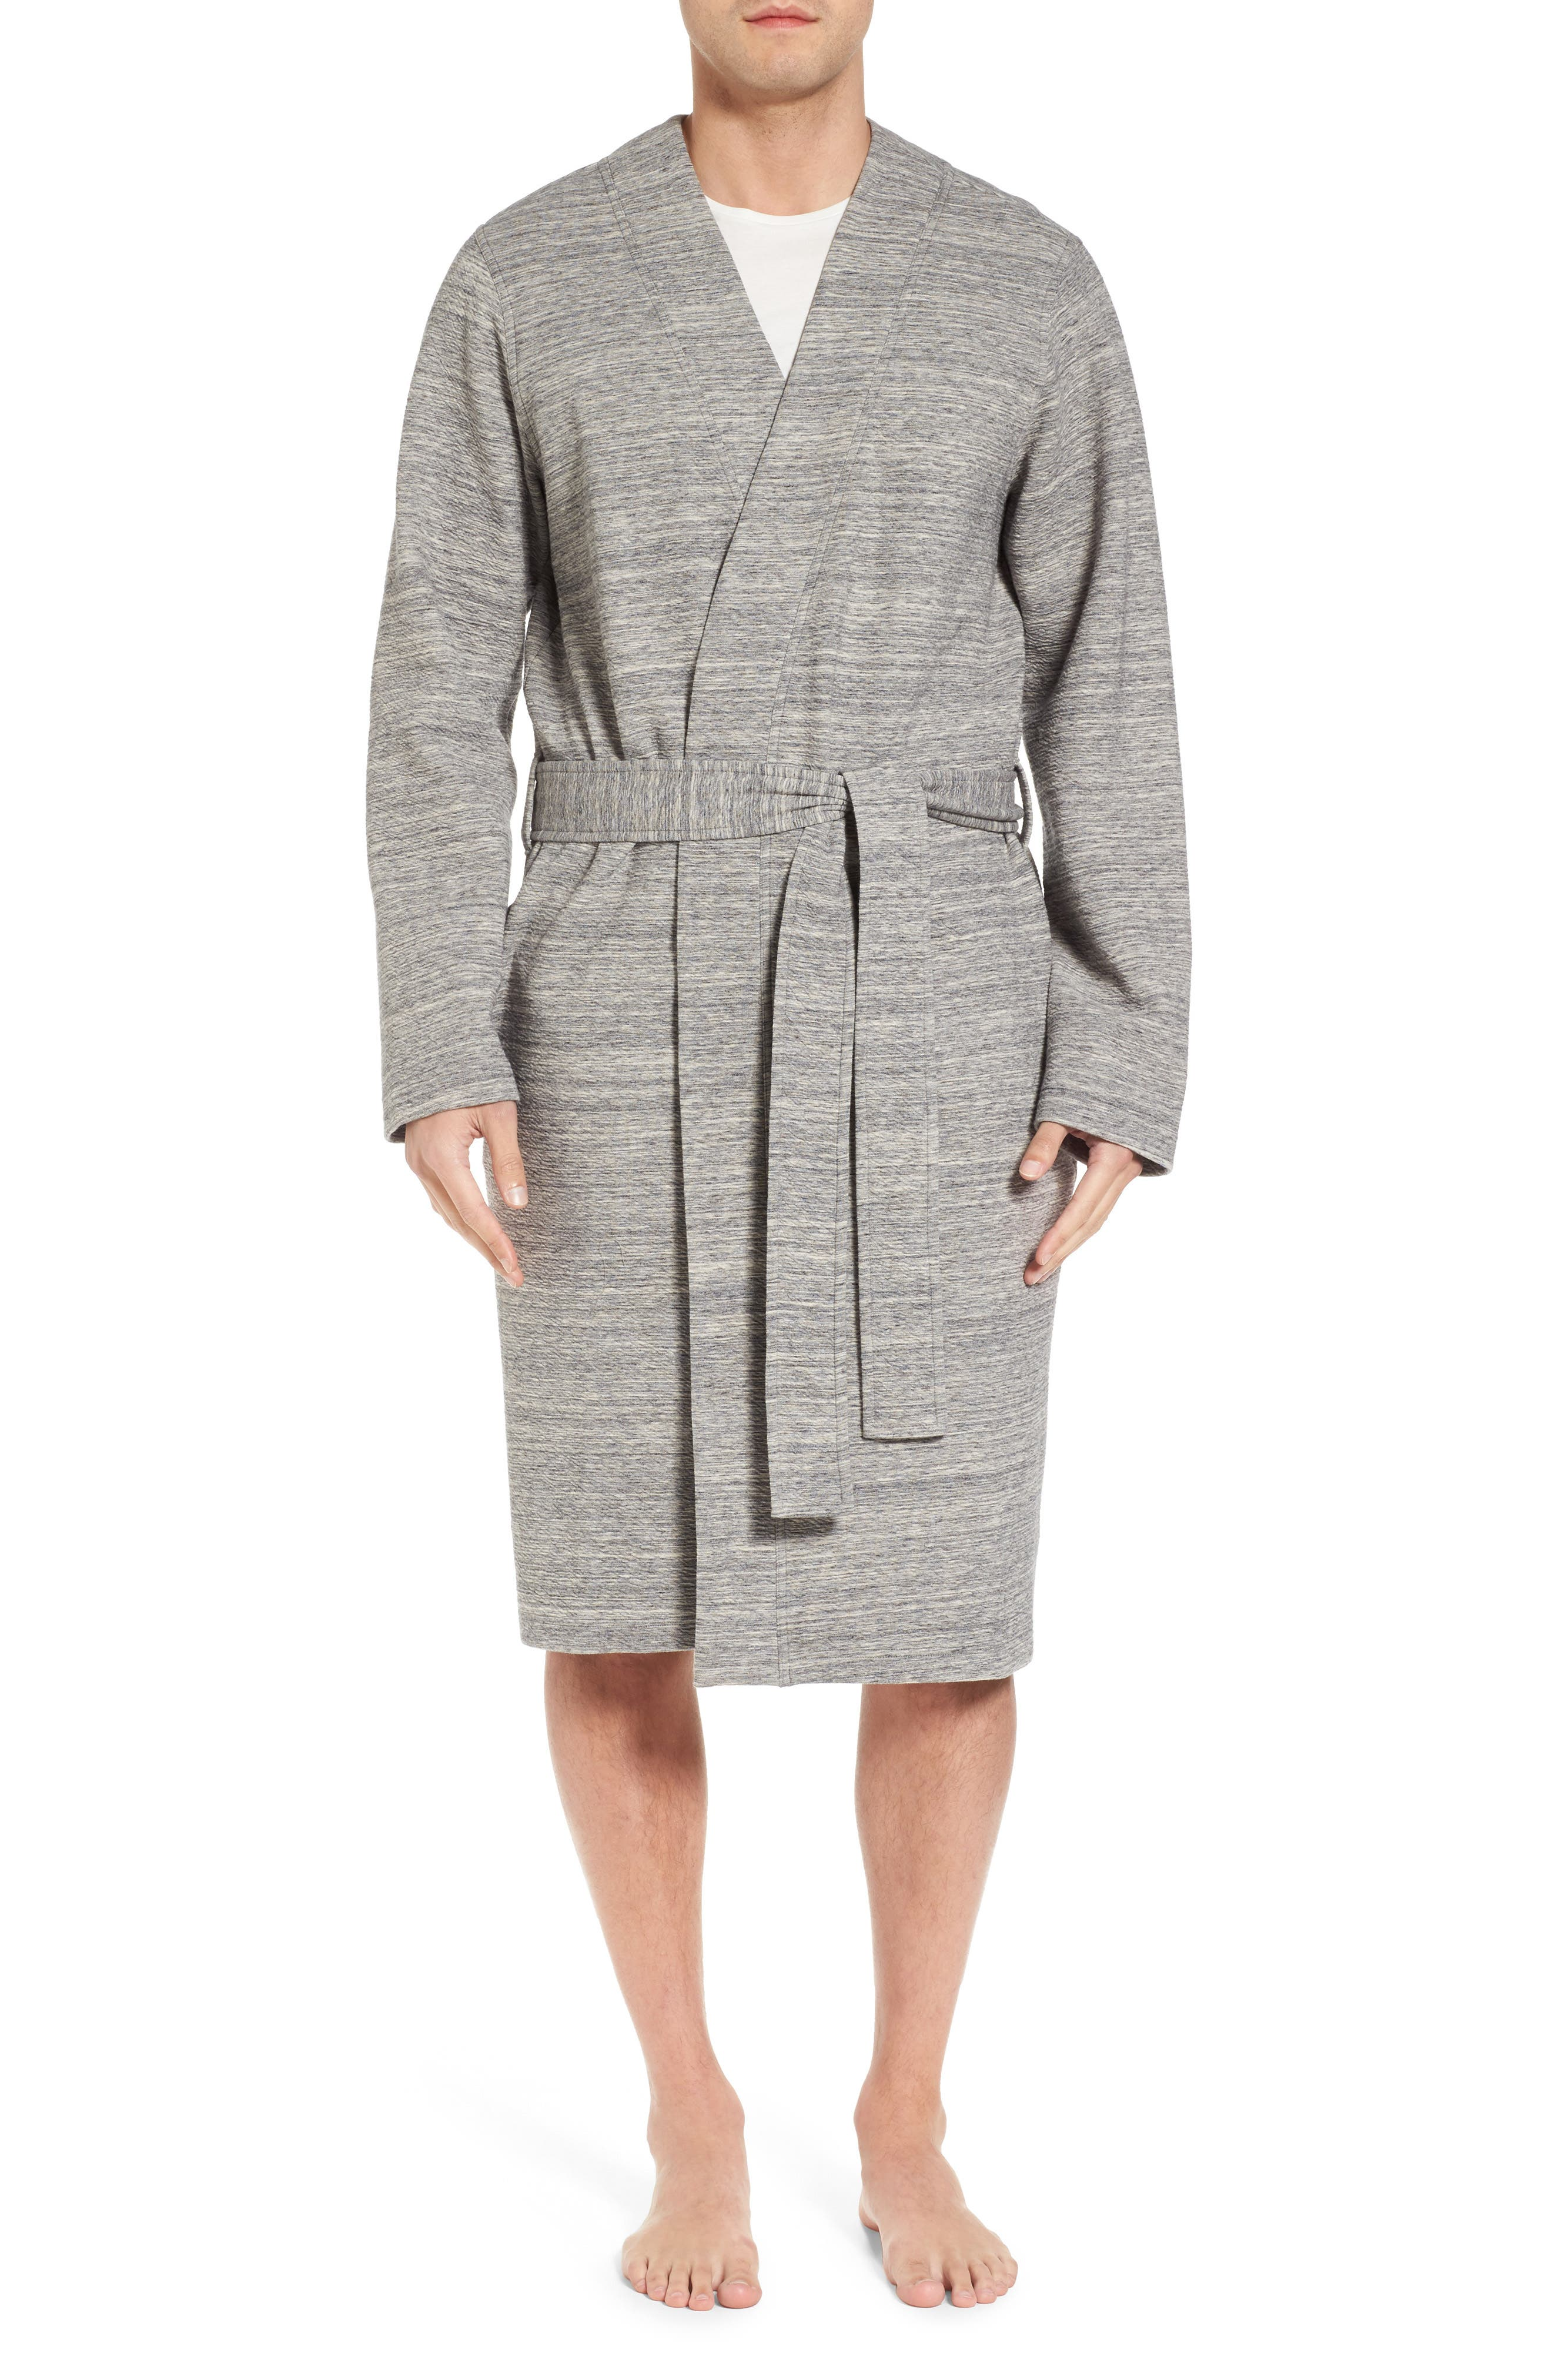 Kent Cotton Blend Robe,                             Main thumbnail 1, color,                             Black Heather